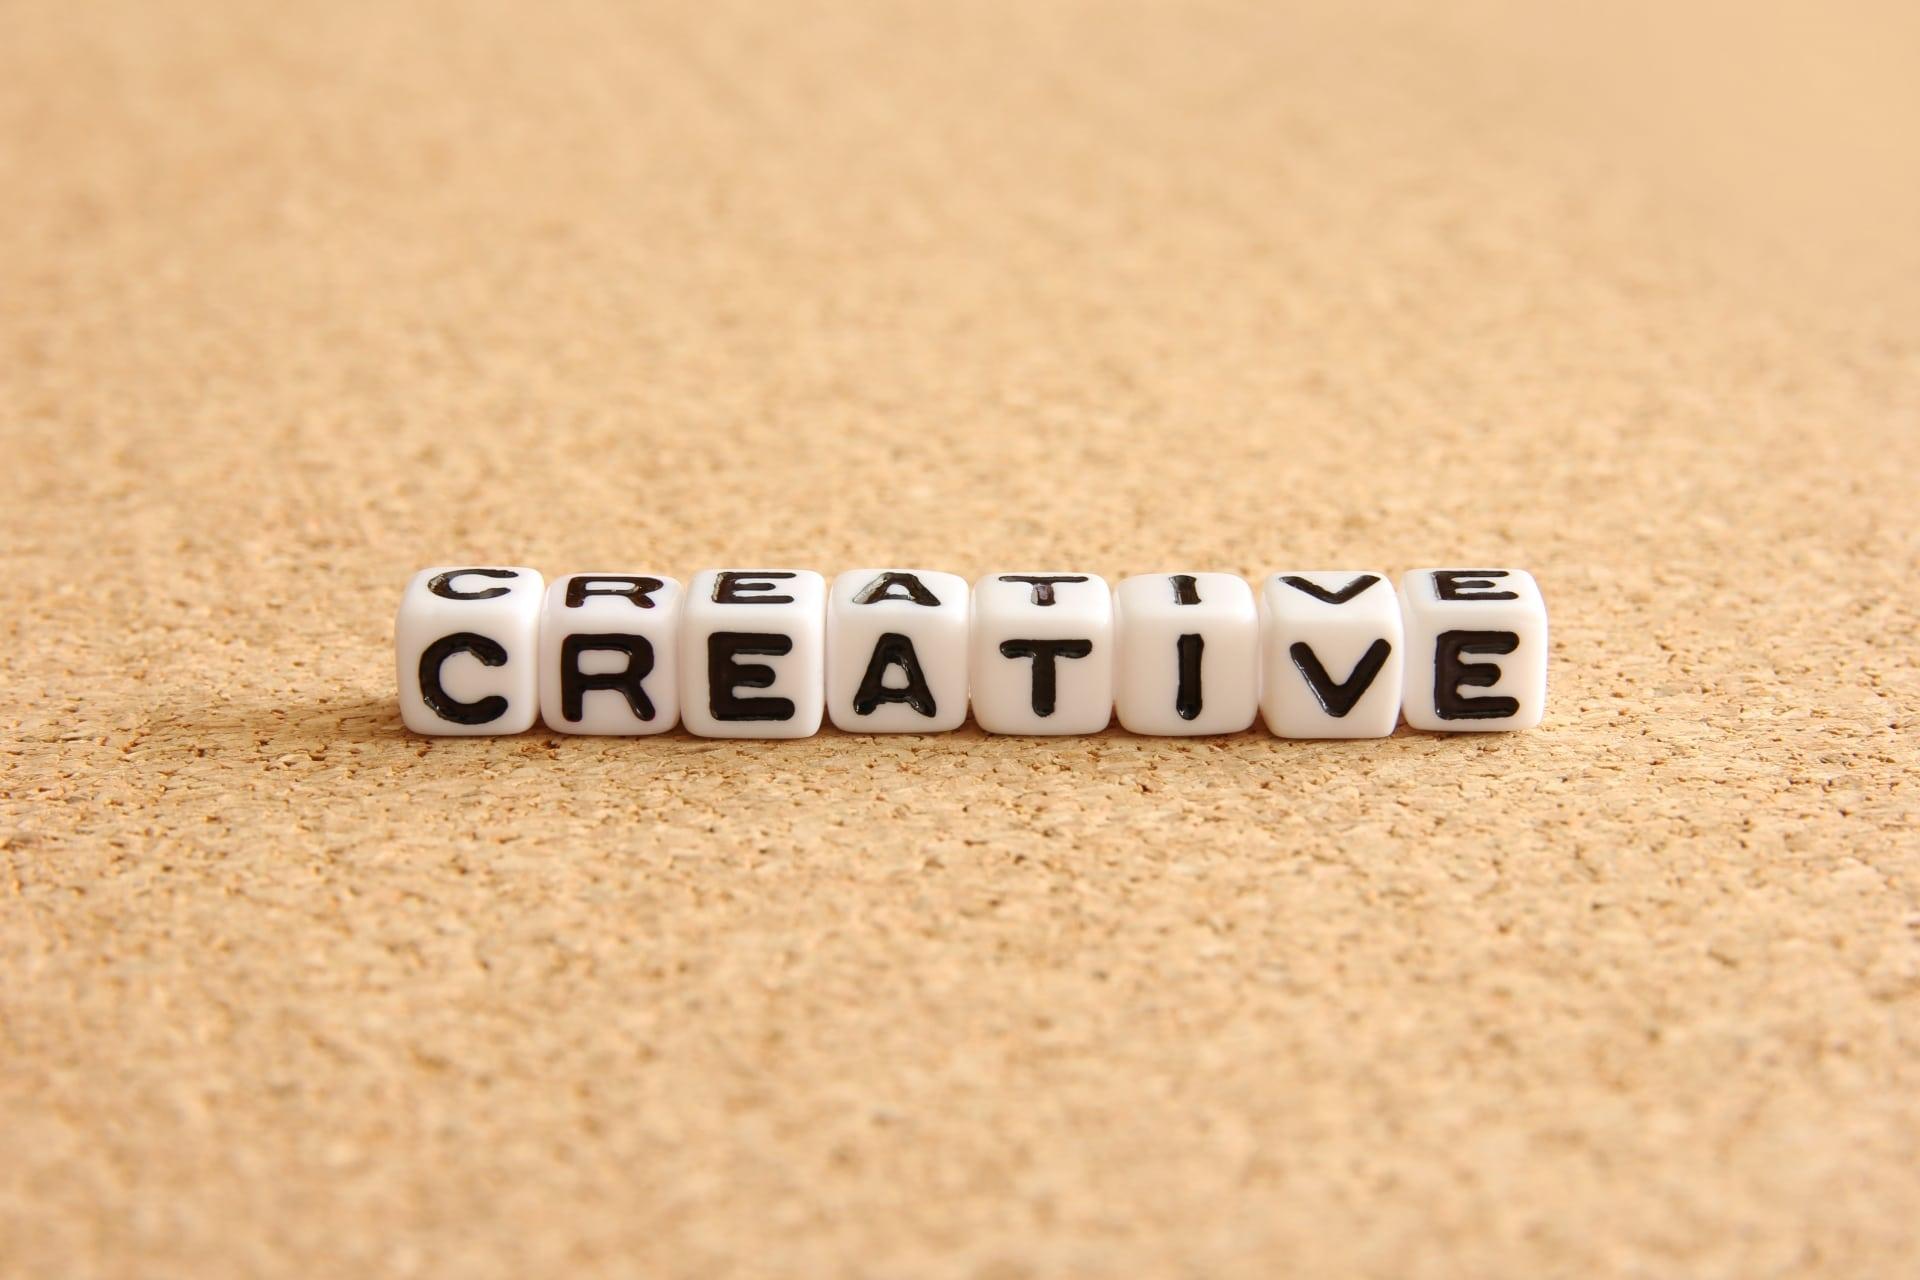 CREATIVEの文字